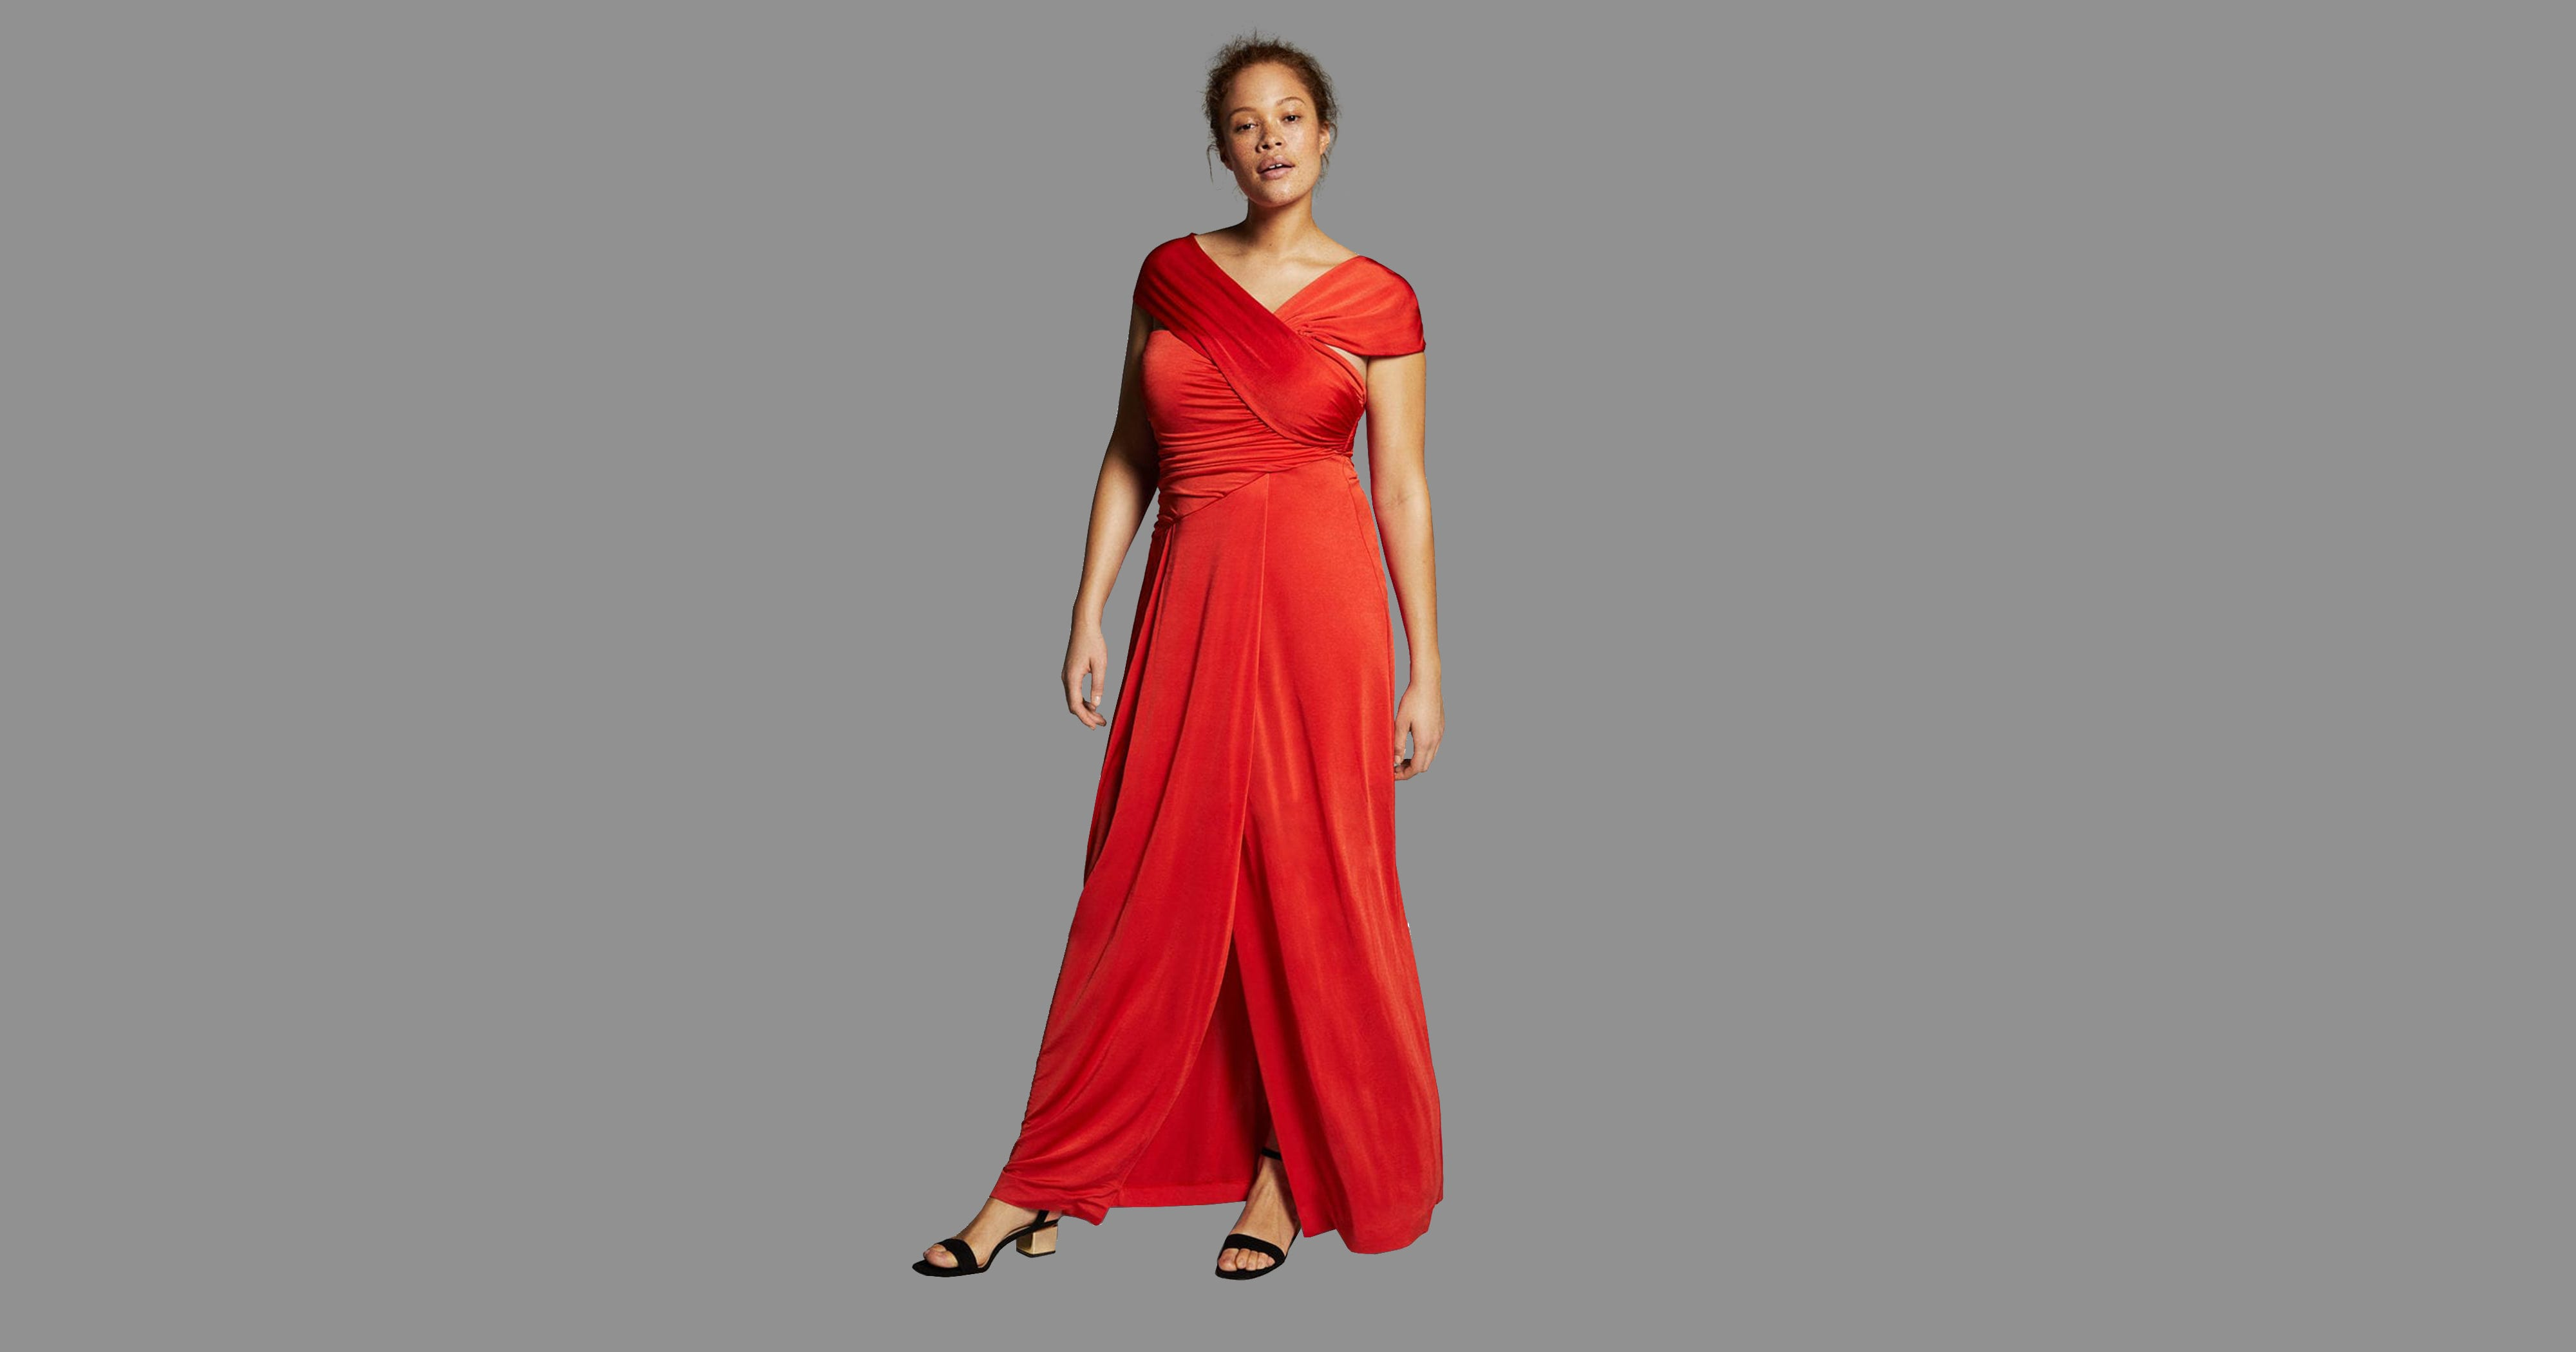 3cadf9e4e918 Plus Size Prom Dresses - High Low Styles